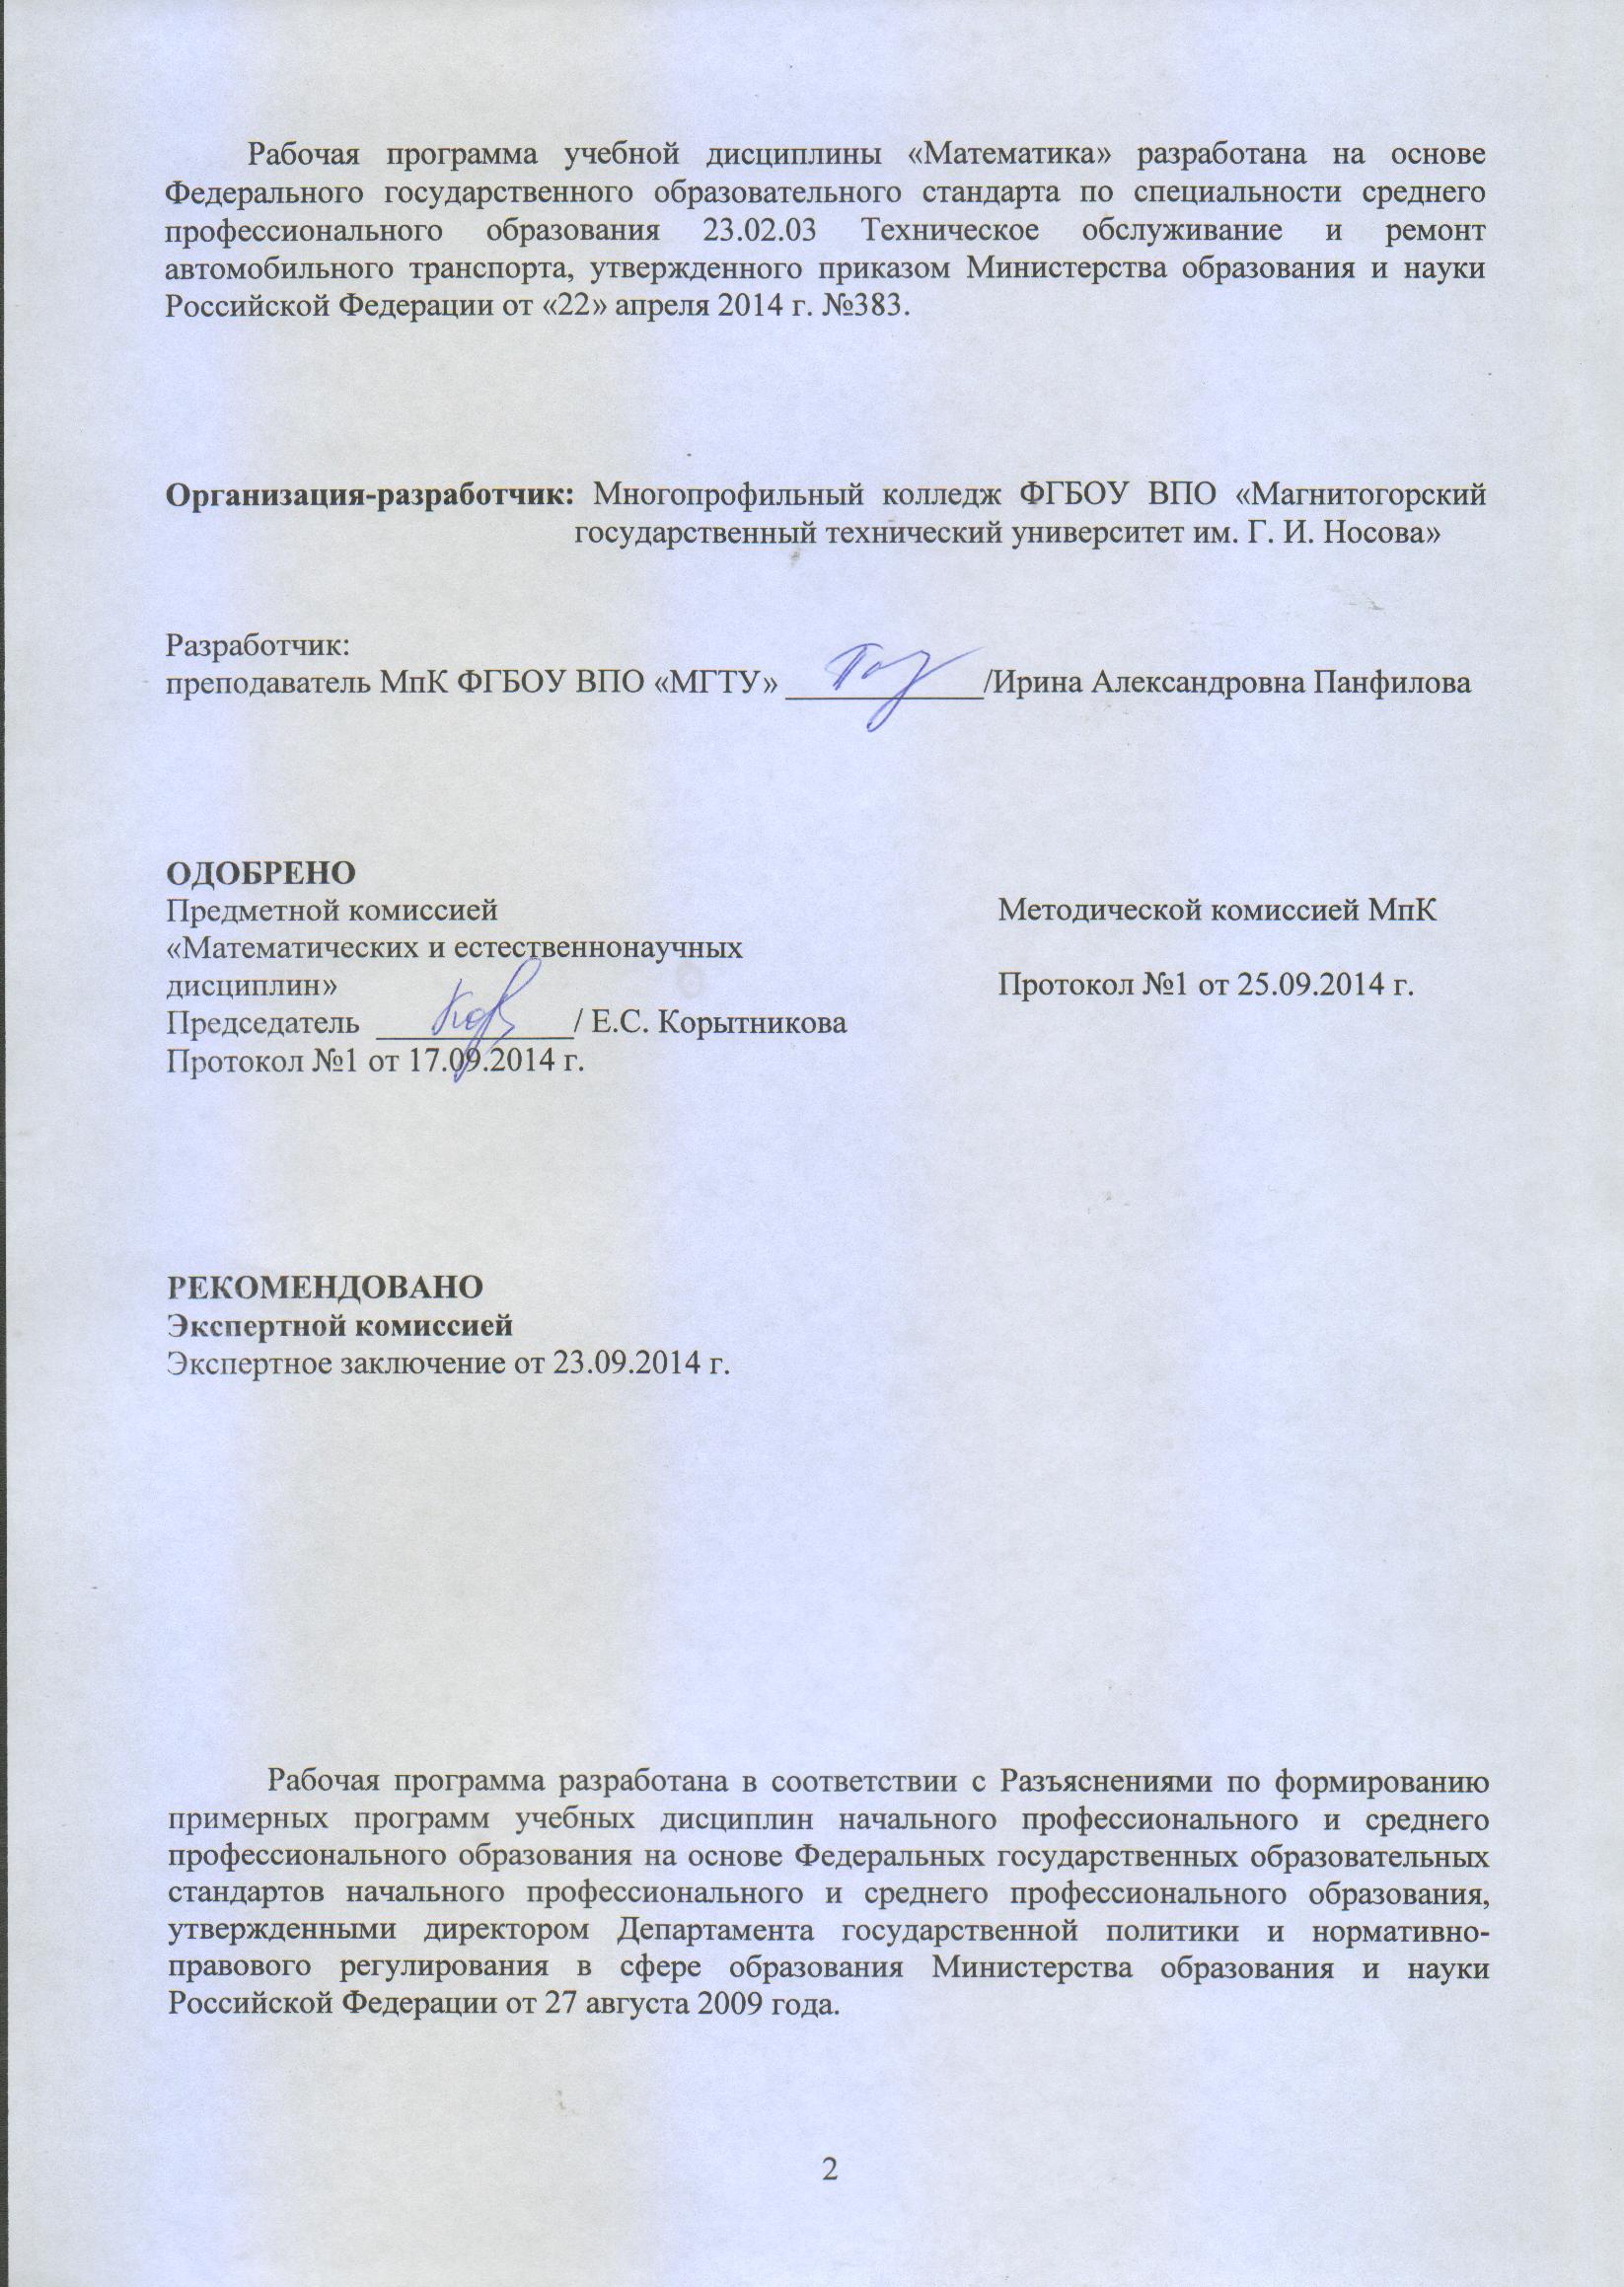 D:\Documents and Settings\m.shemetova\Рабочий стол\сканы\230203\22.bmp